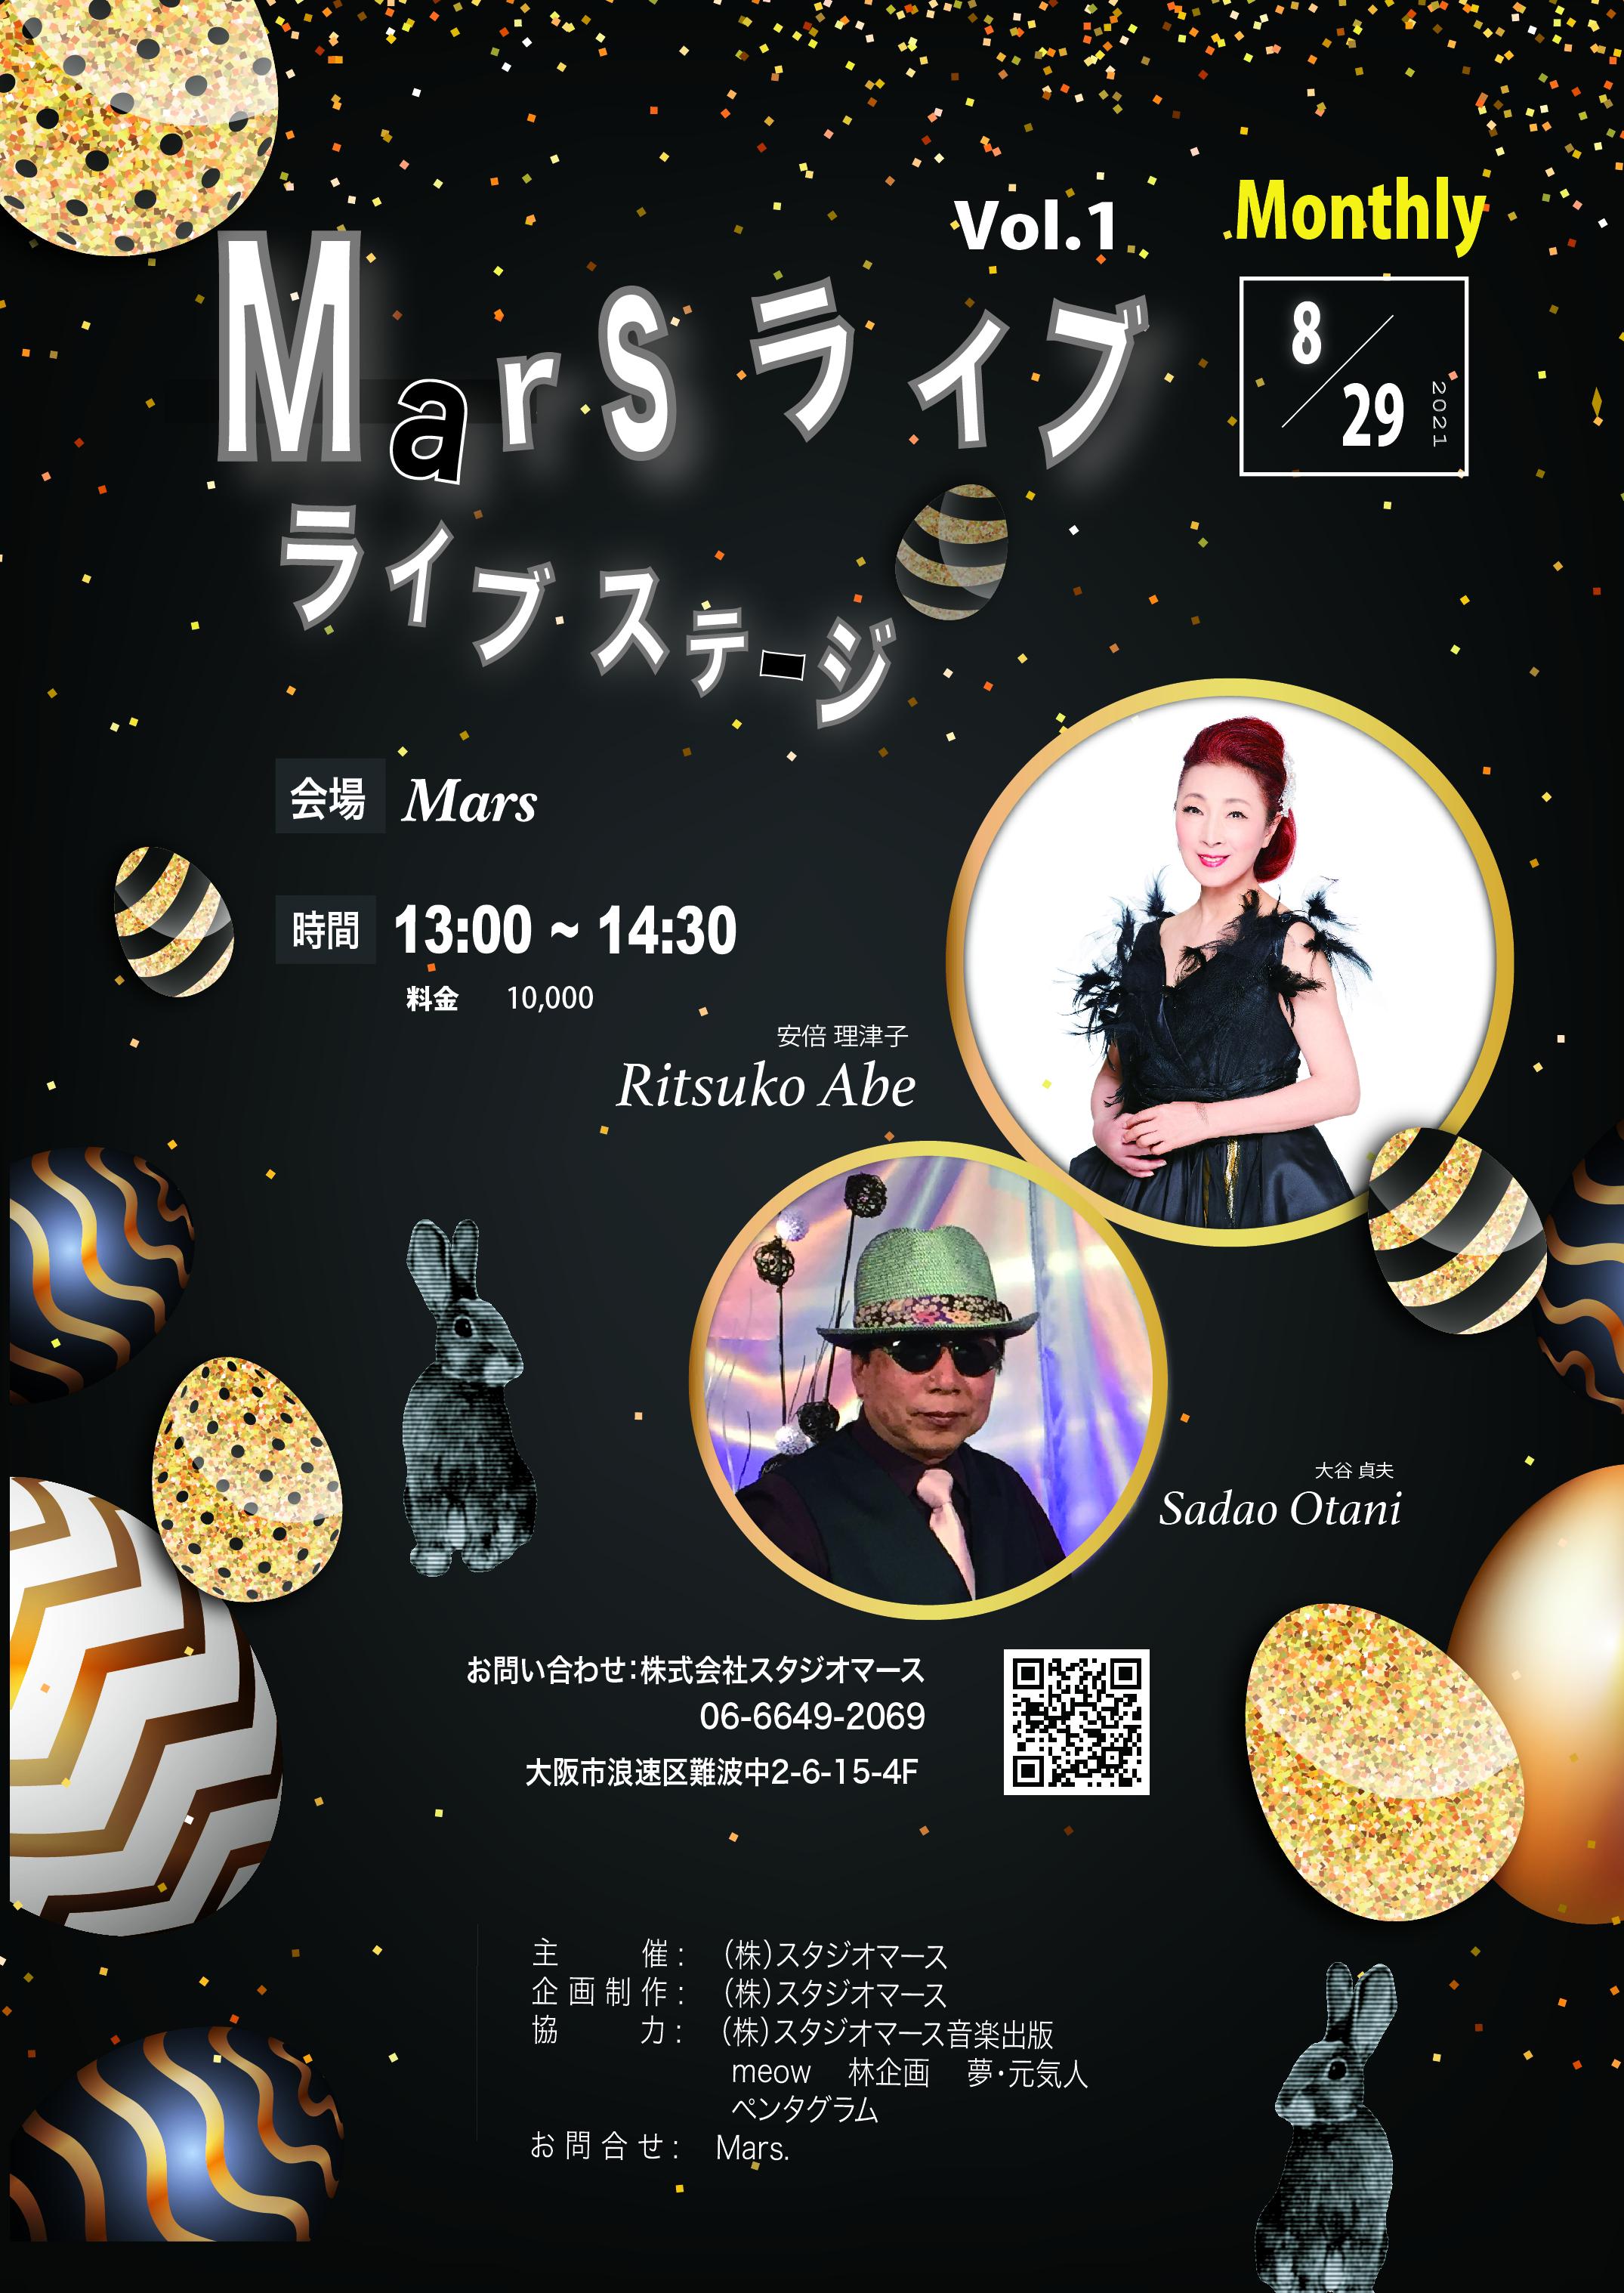 B5_tate_omote [更新済み].eps のコピー 2-01.jpg